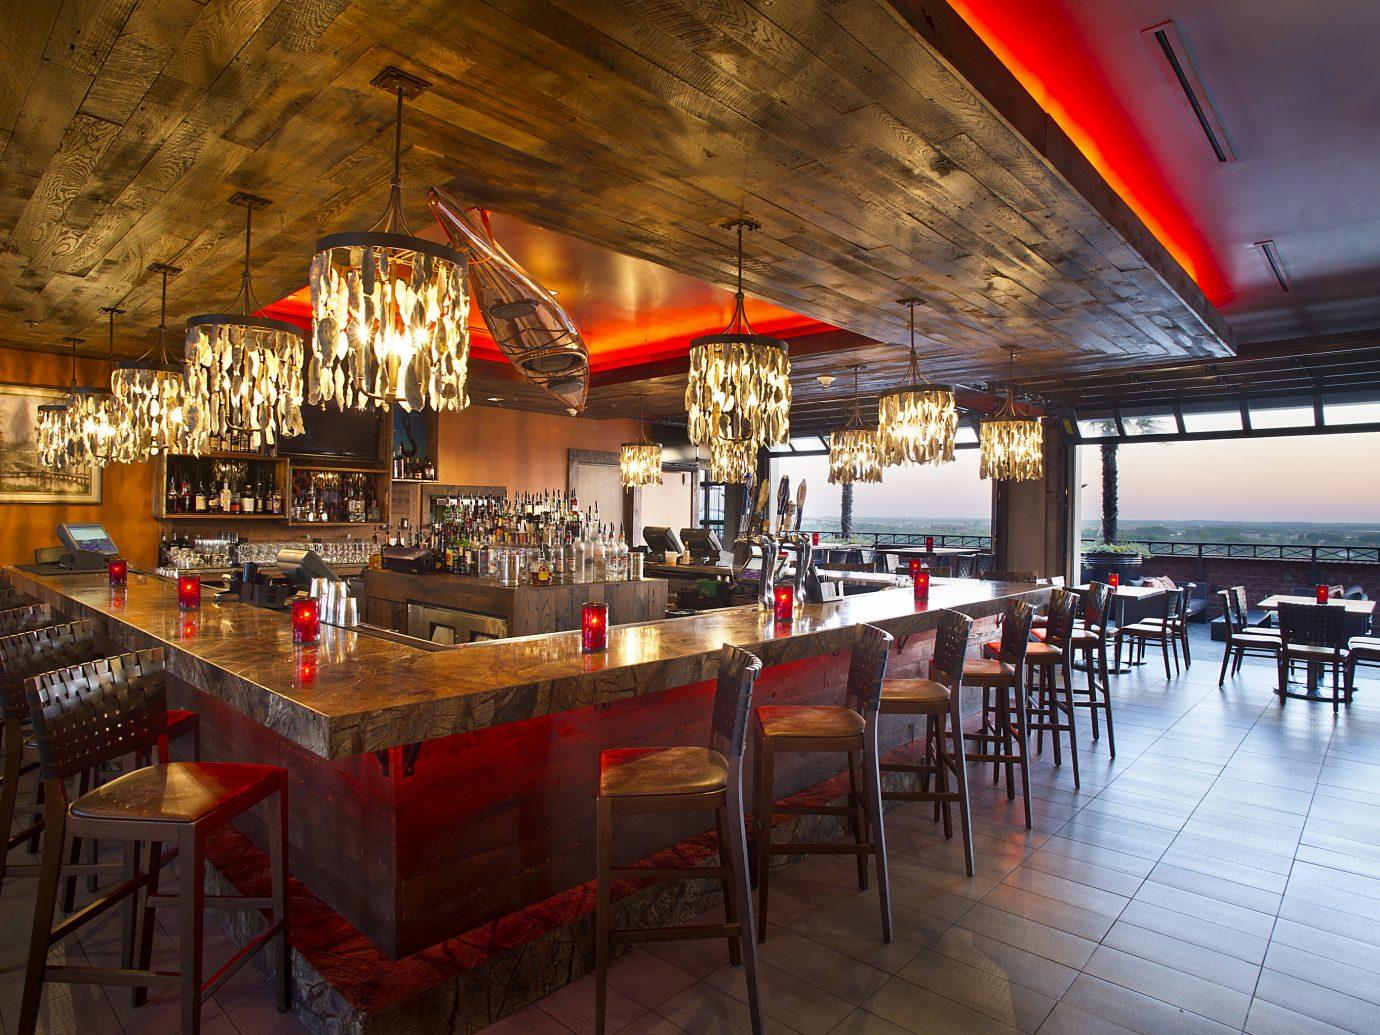 Boutique Hotels Food + Drink Girls Getaways Weekend Getaways table floor indoor chair ceiling restaurant interior design Bar Dining café area several